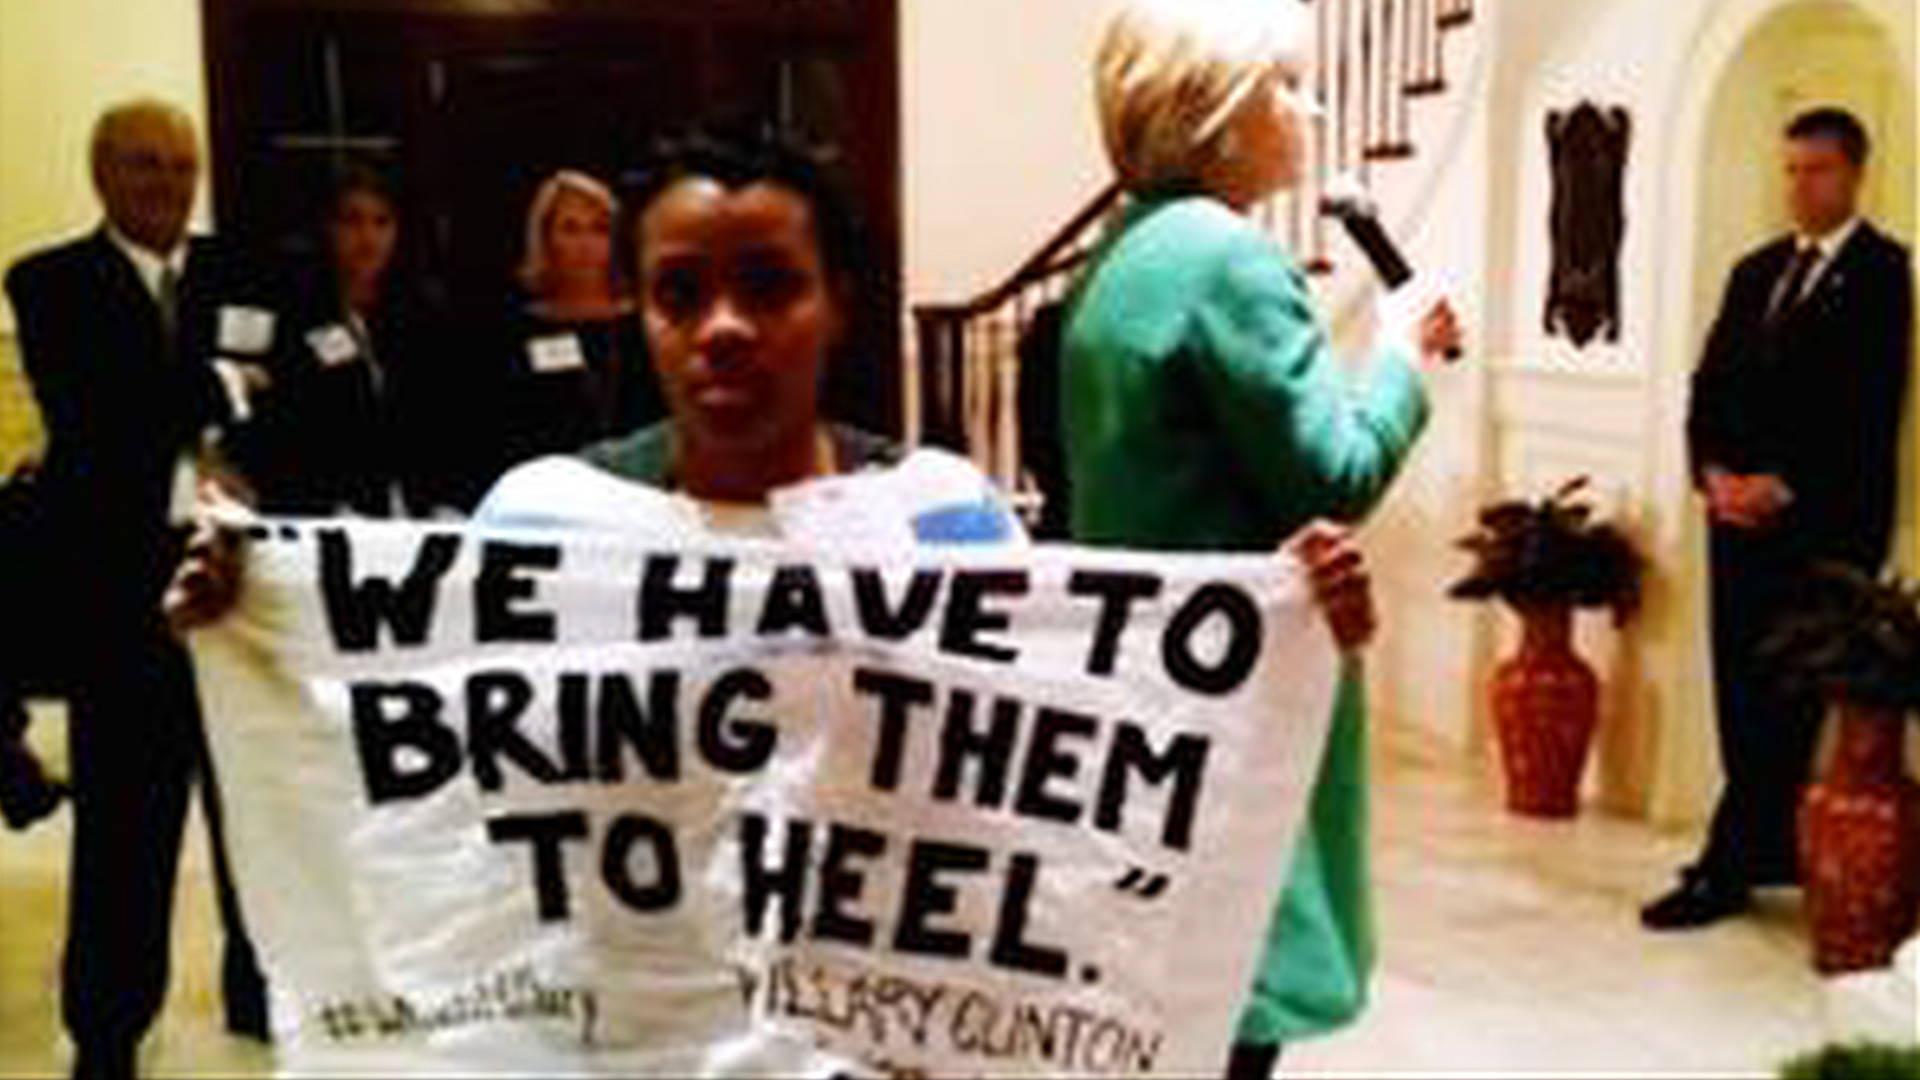 #blacklivesmatter Activist Demands Apology From Clinton For